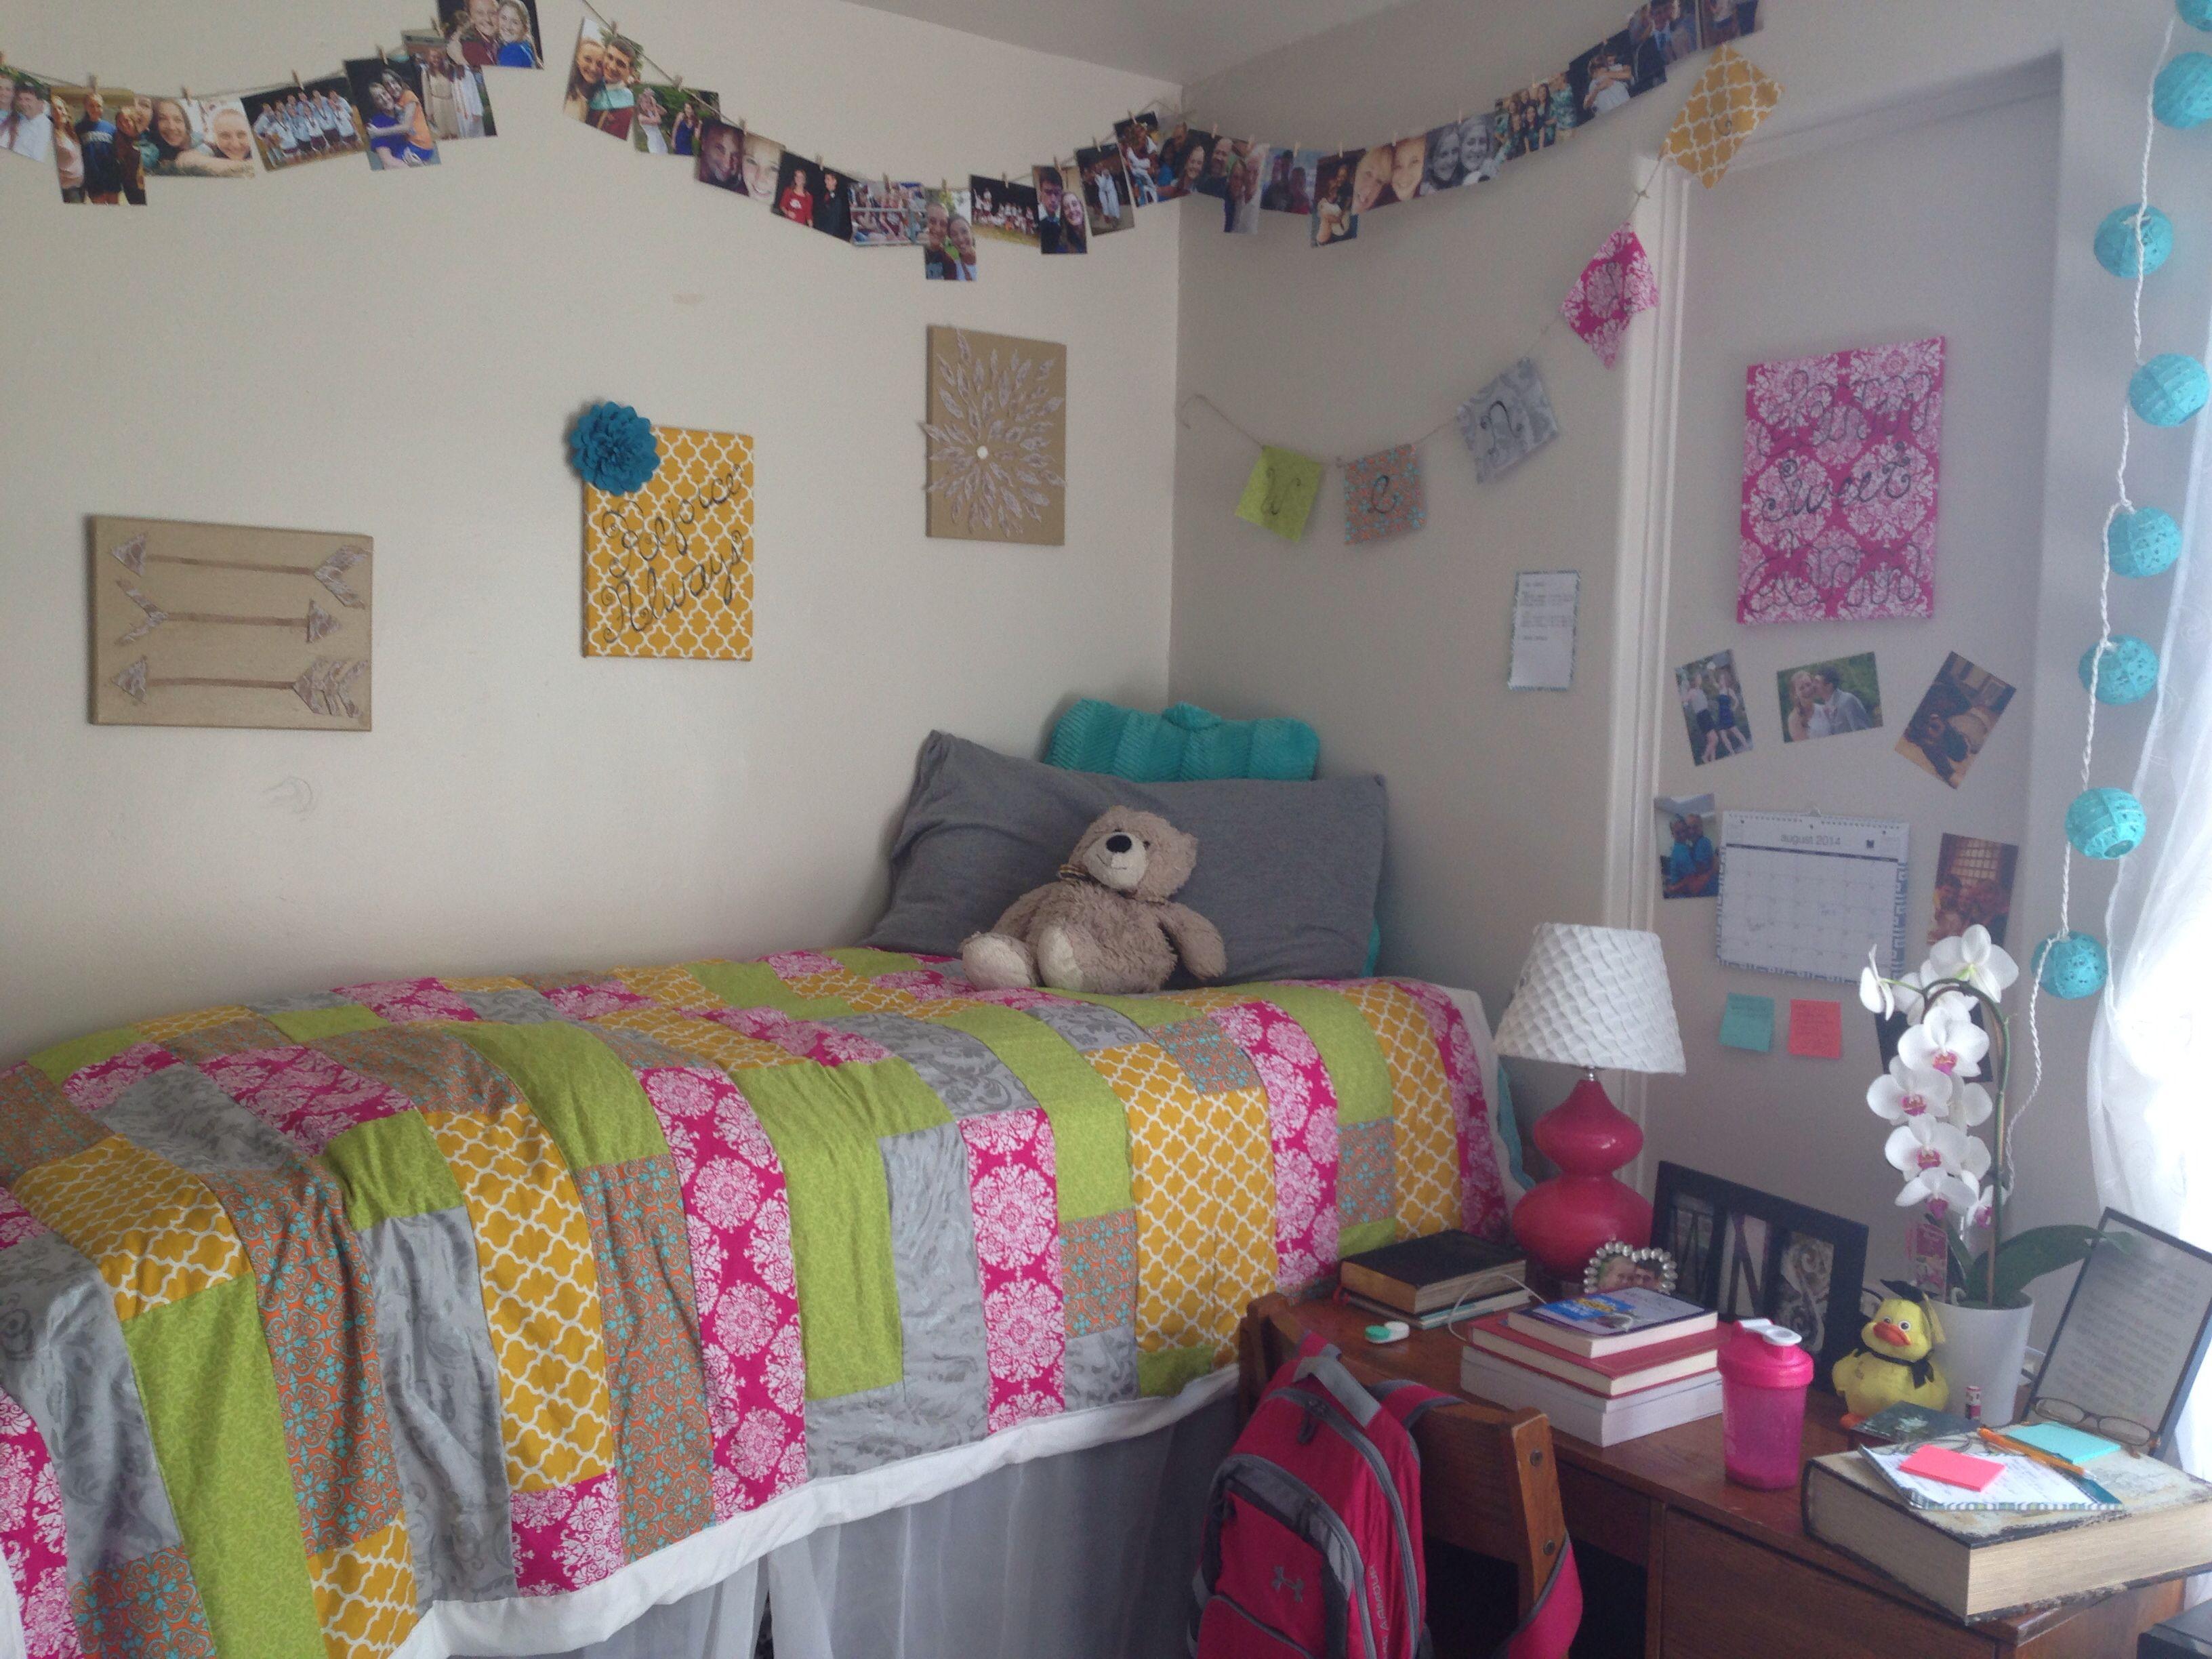 Pinterest Inspired DIY Dorm Decorating Eku Diy Dorm Collegelife Col